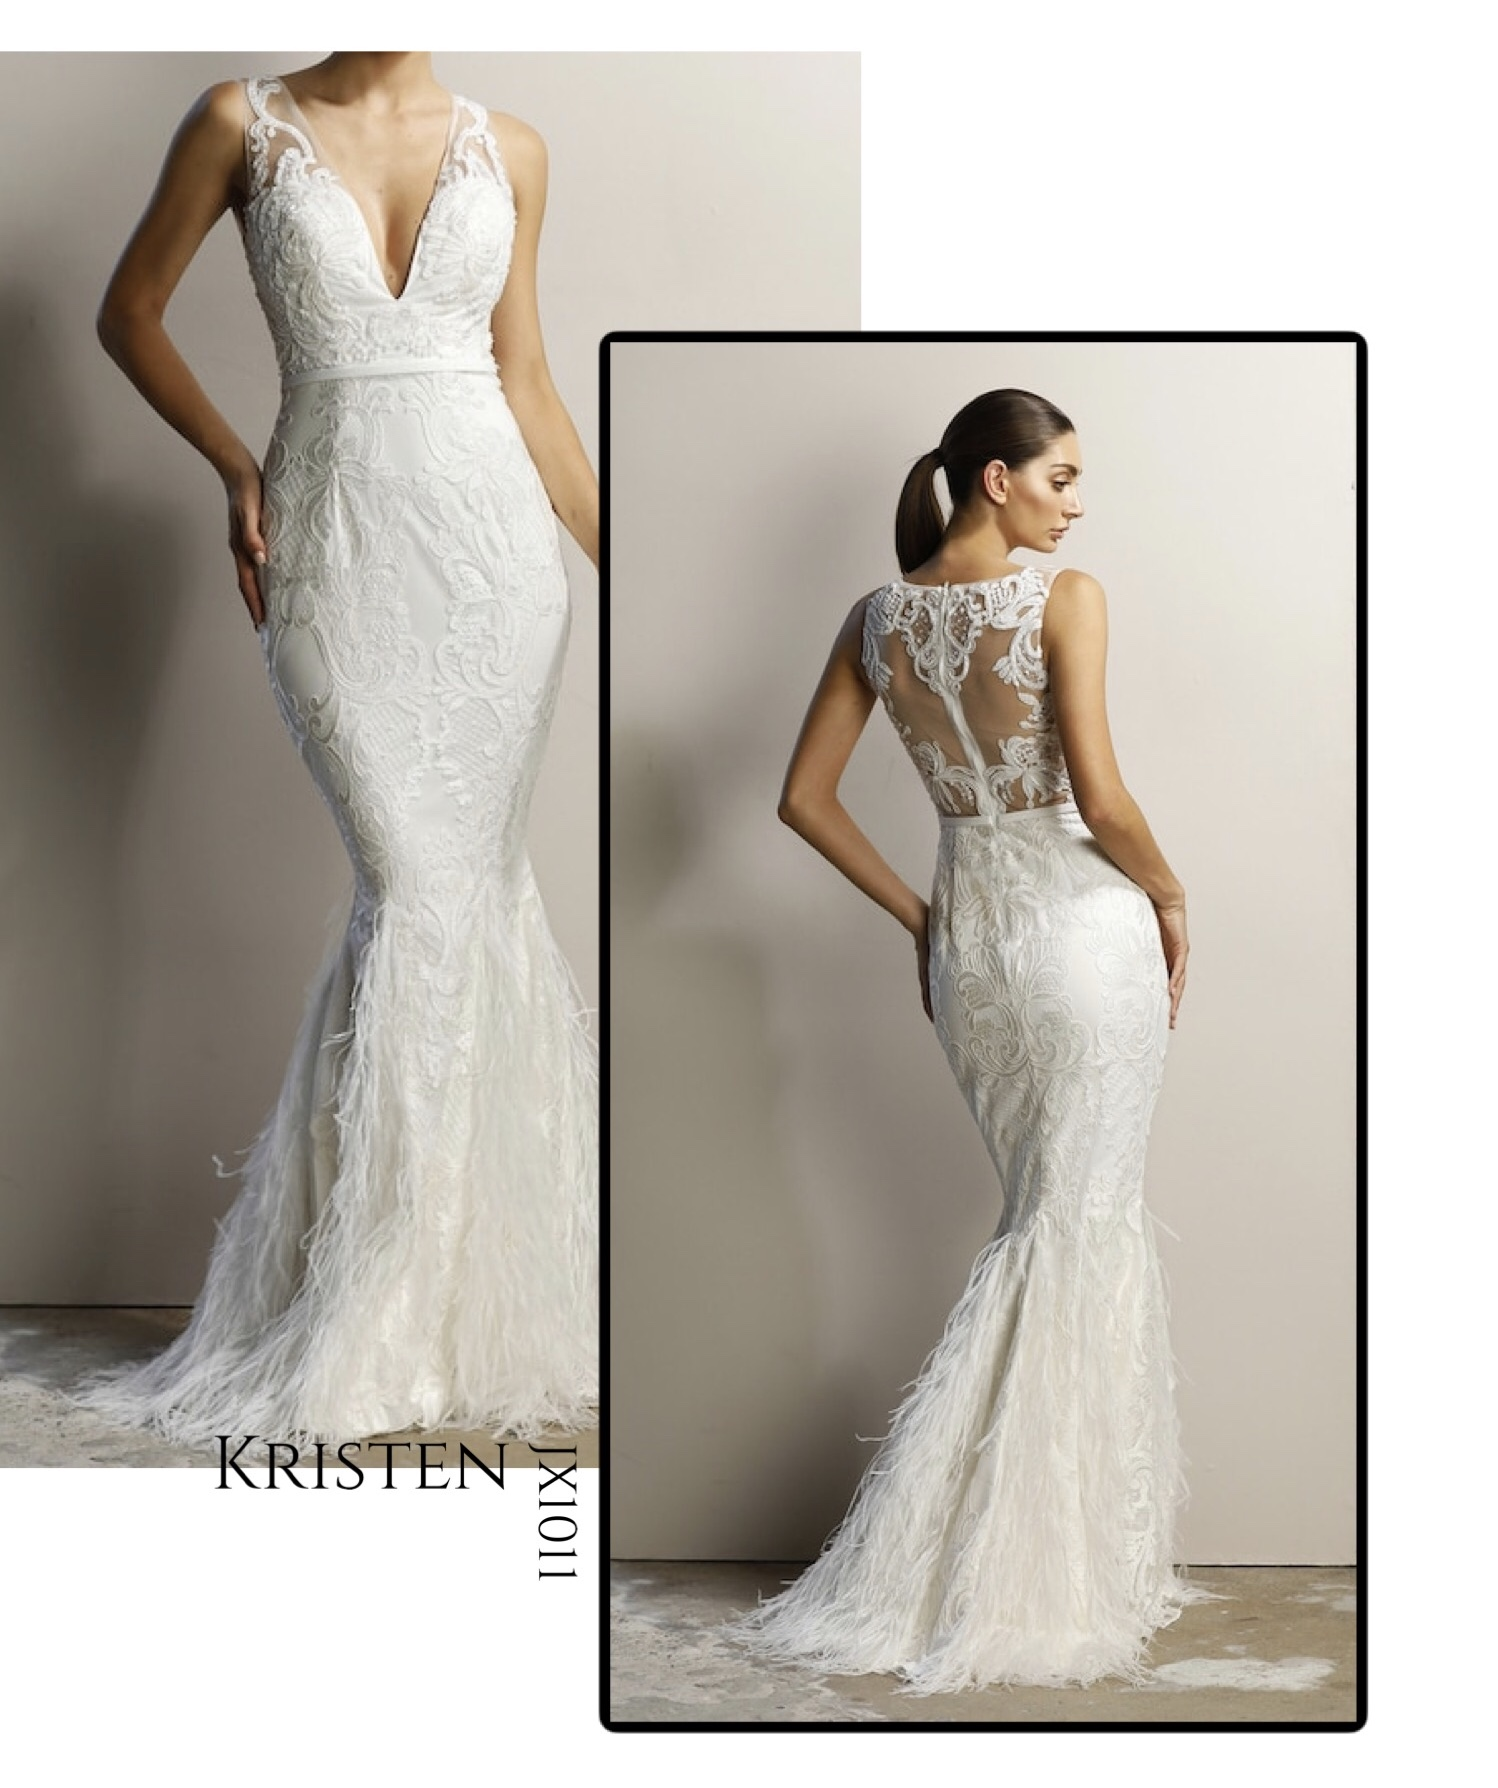 Australian Wedding Reception Dresses - Fashionably Yours